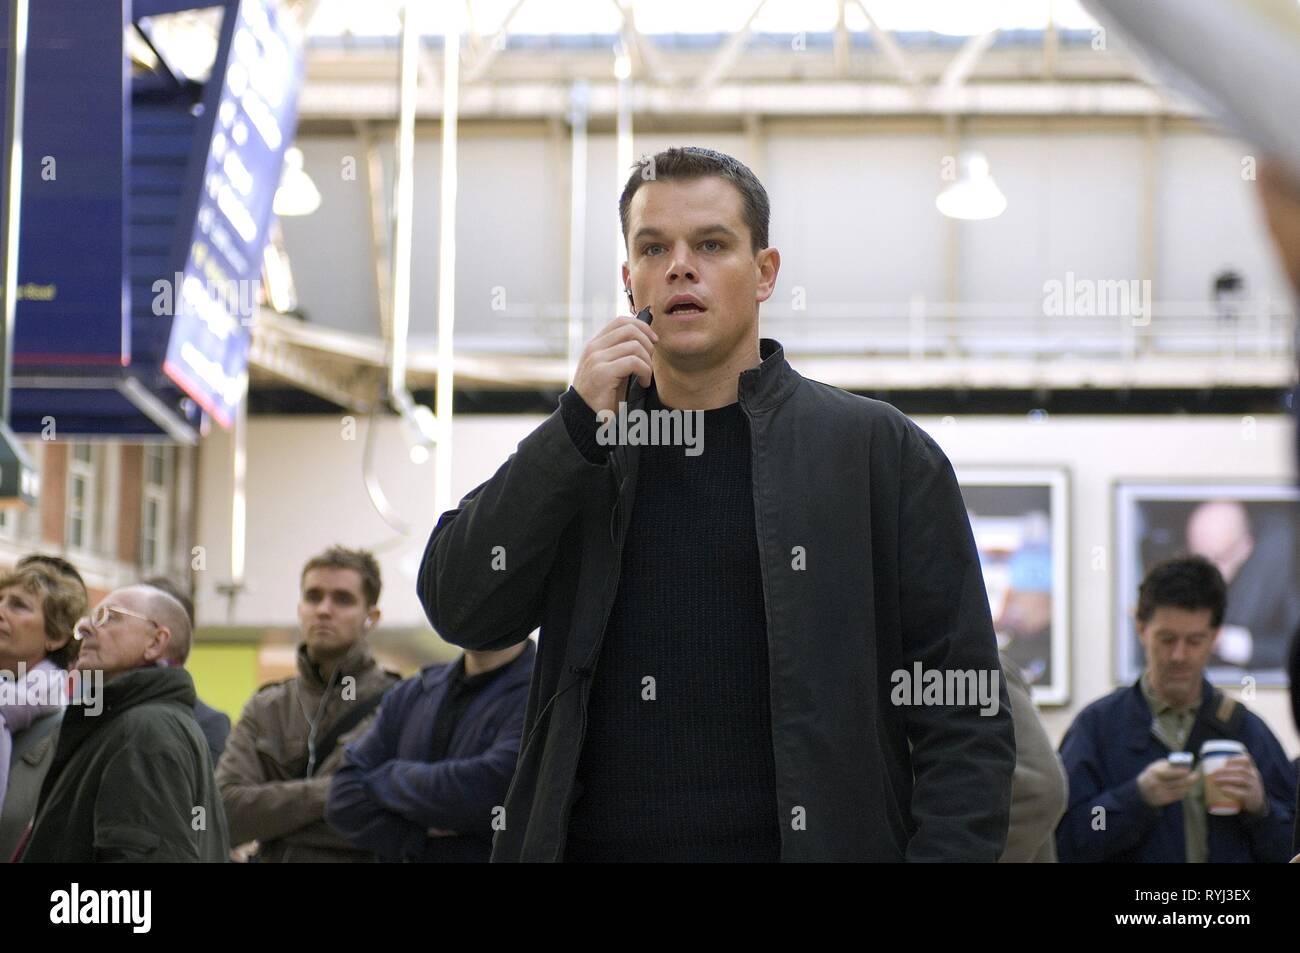 Matt Damon The Bourne Ultimatum 2007 Stock Photo Alamy